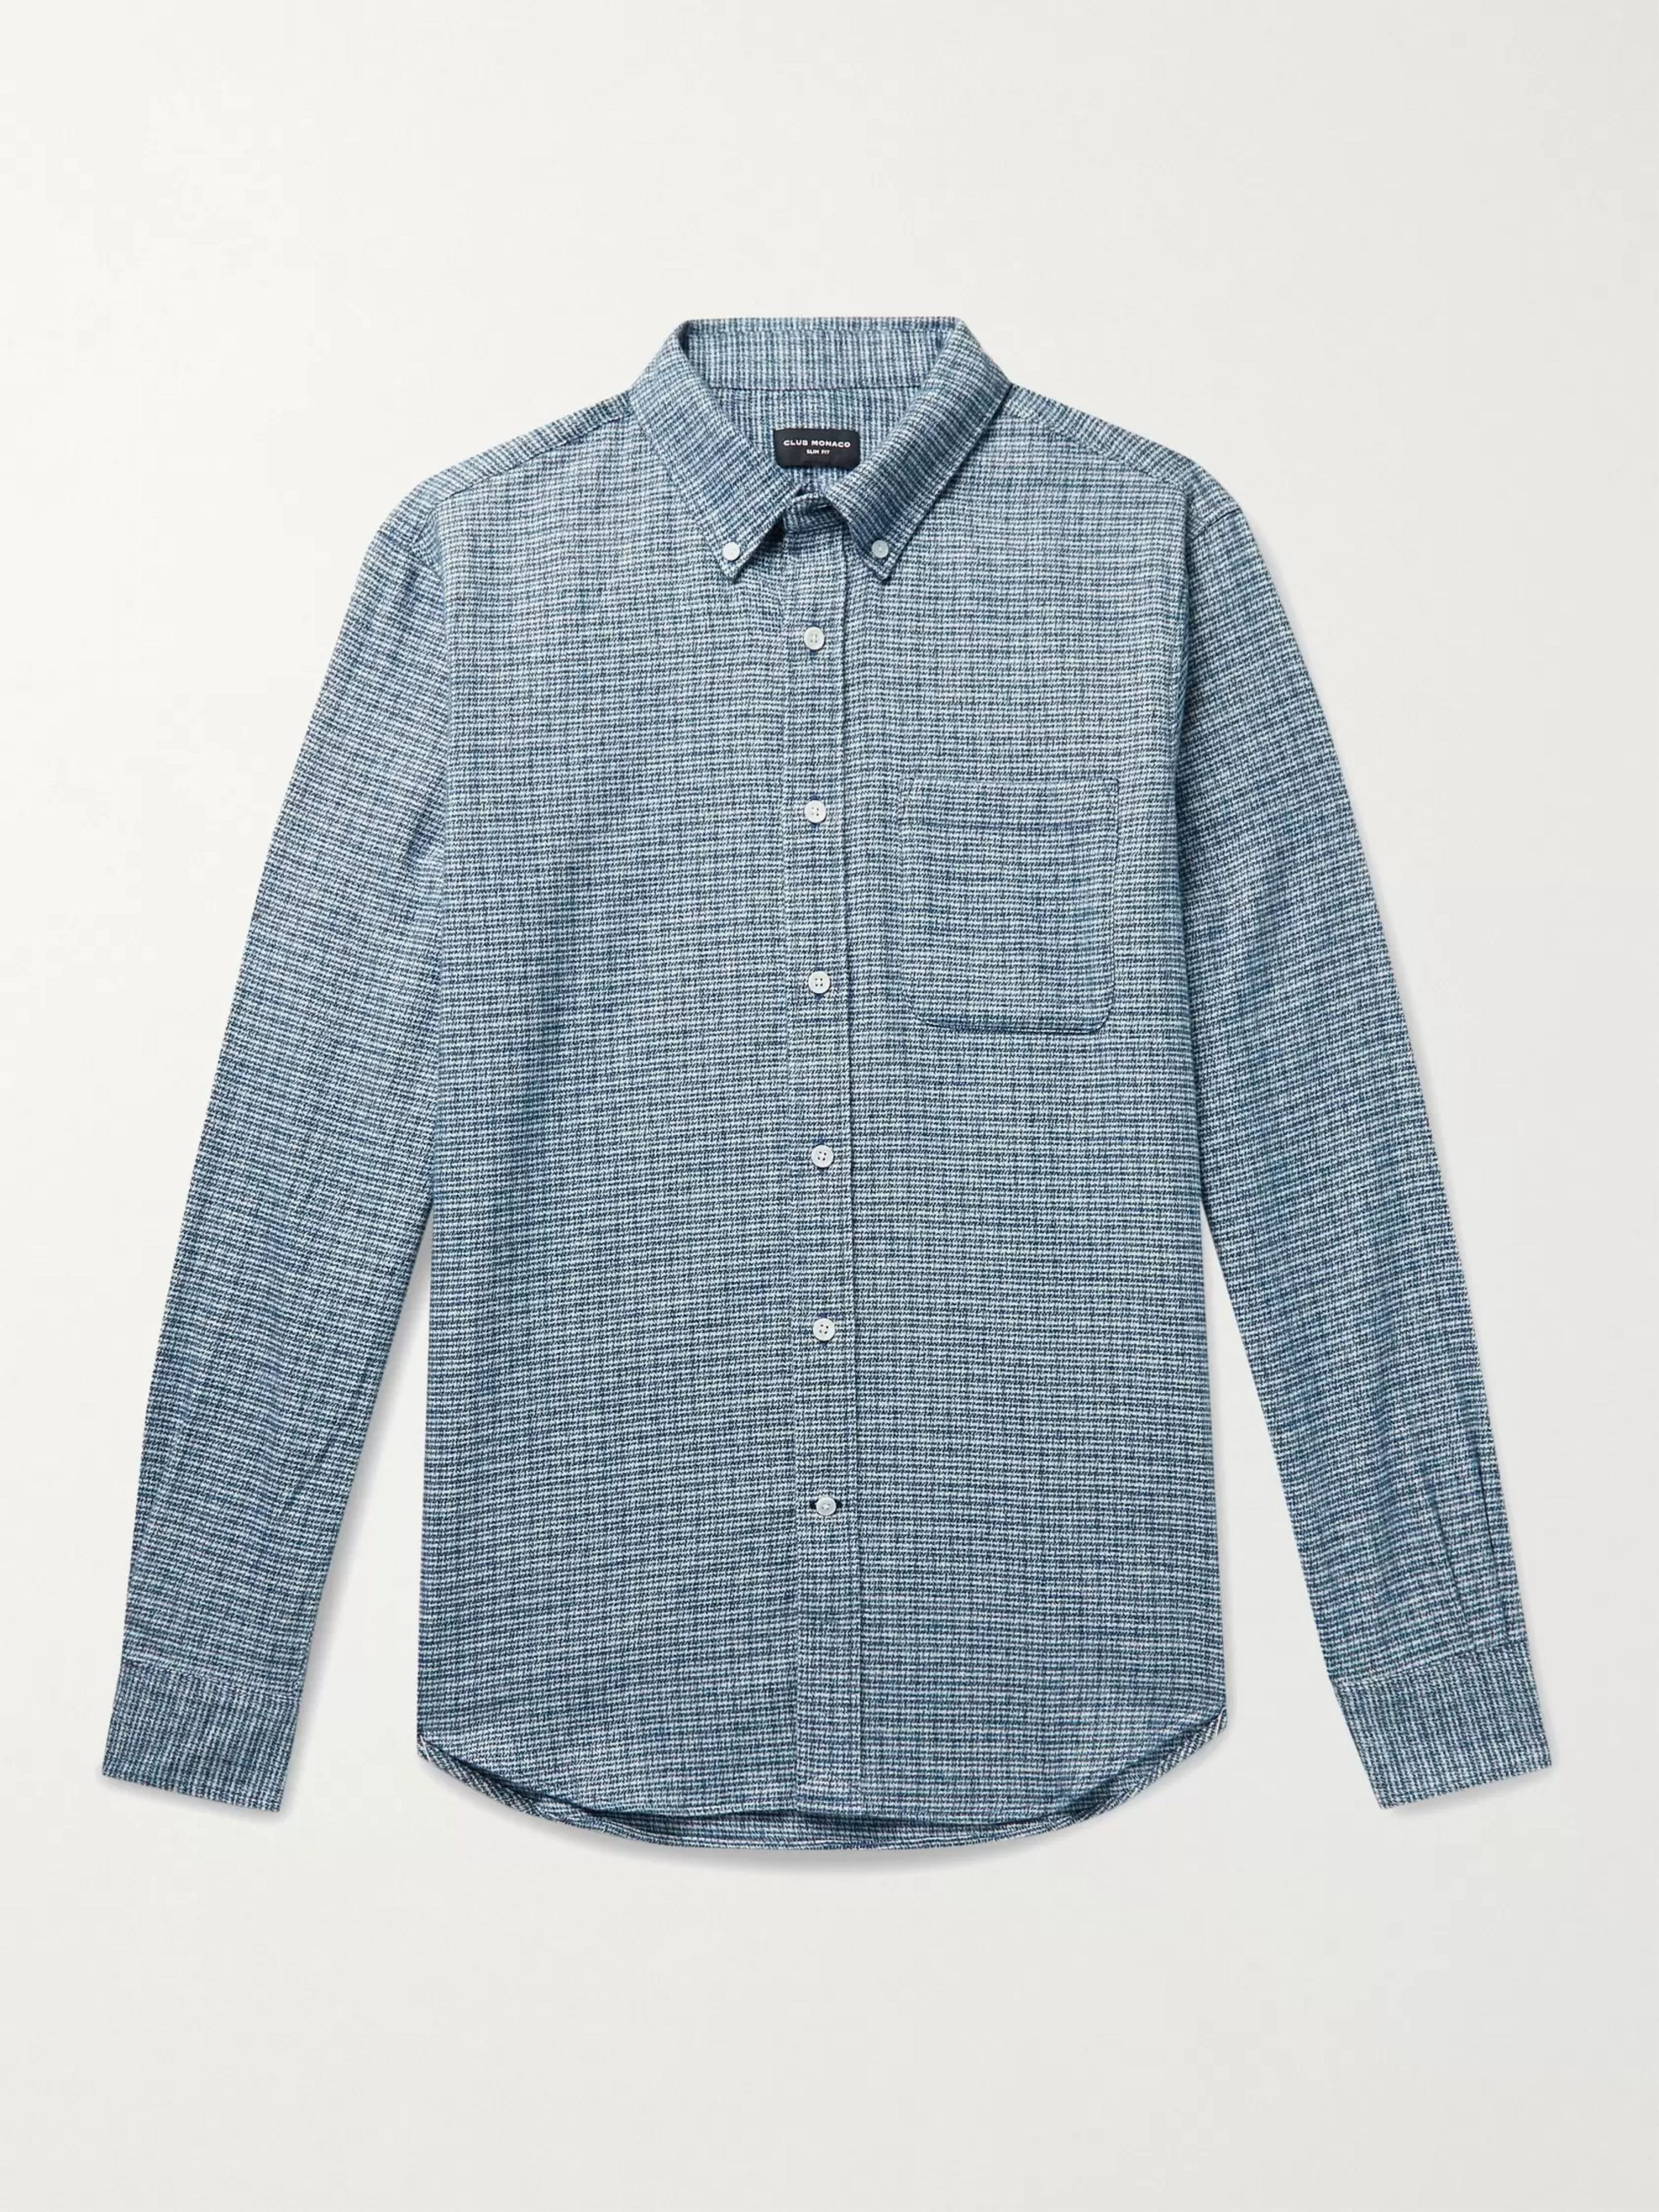 CLUB MONACO Slim-Fit Button-Down Collar Puppytooth Cotton-Jaspe Shirt